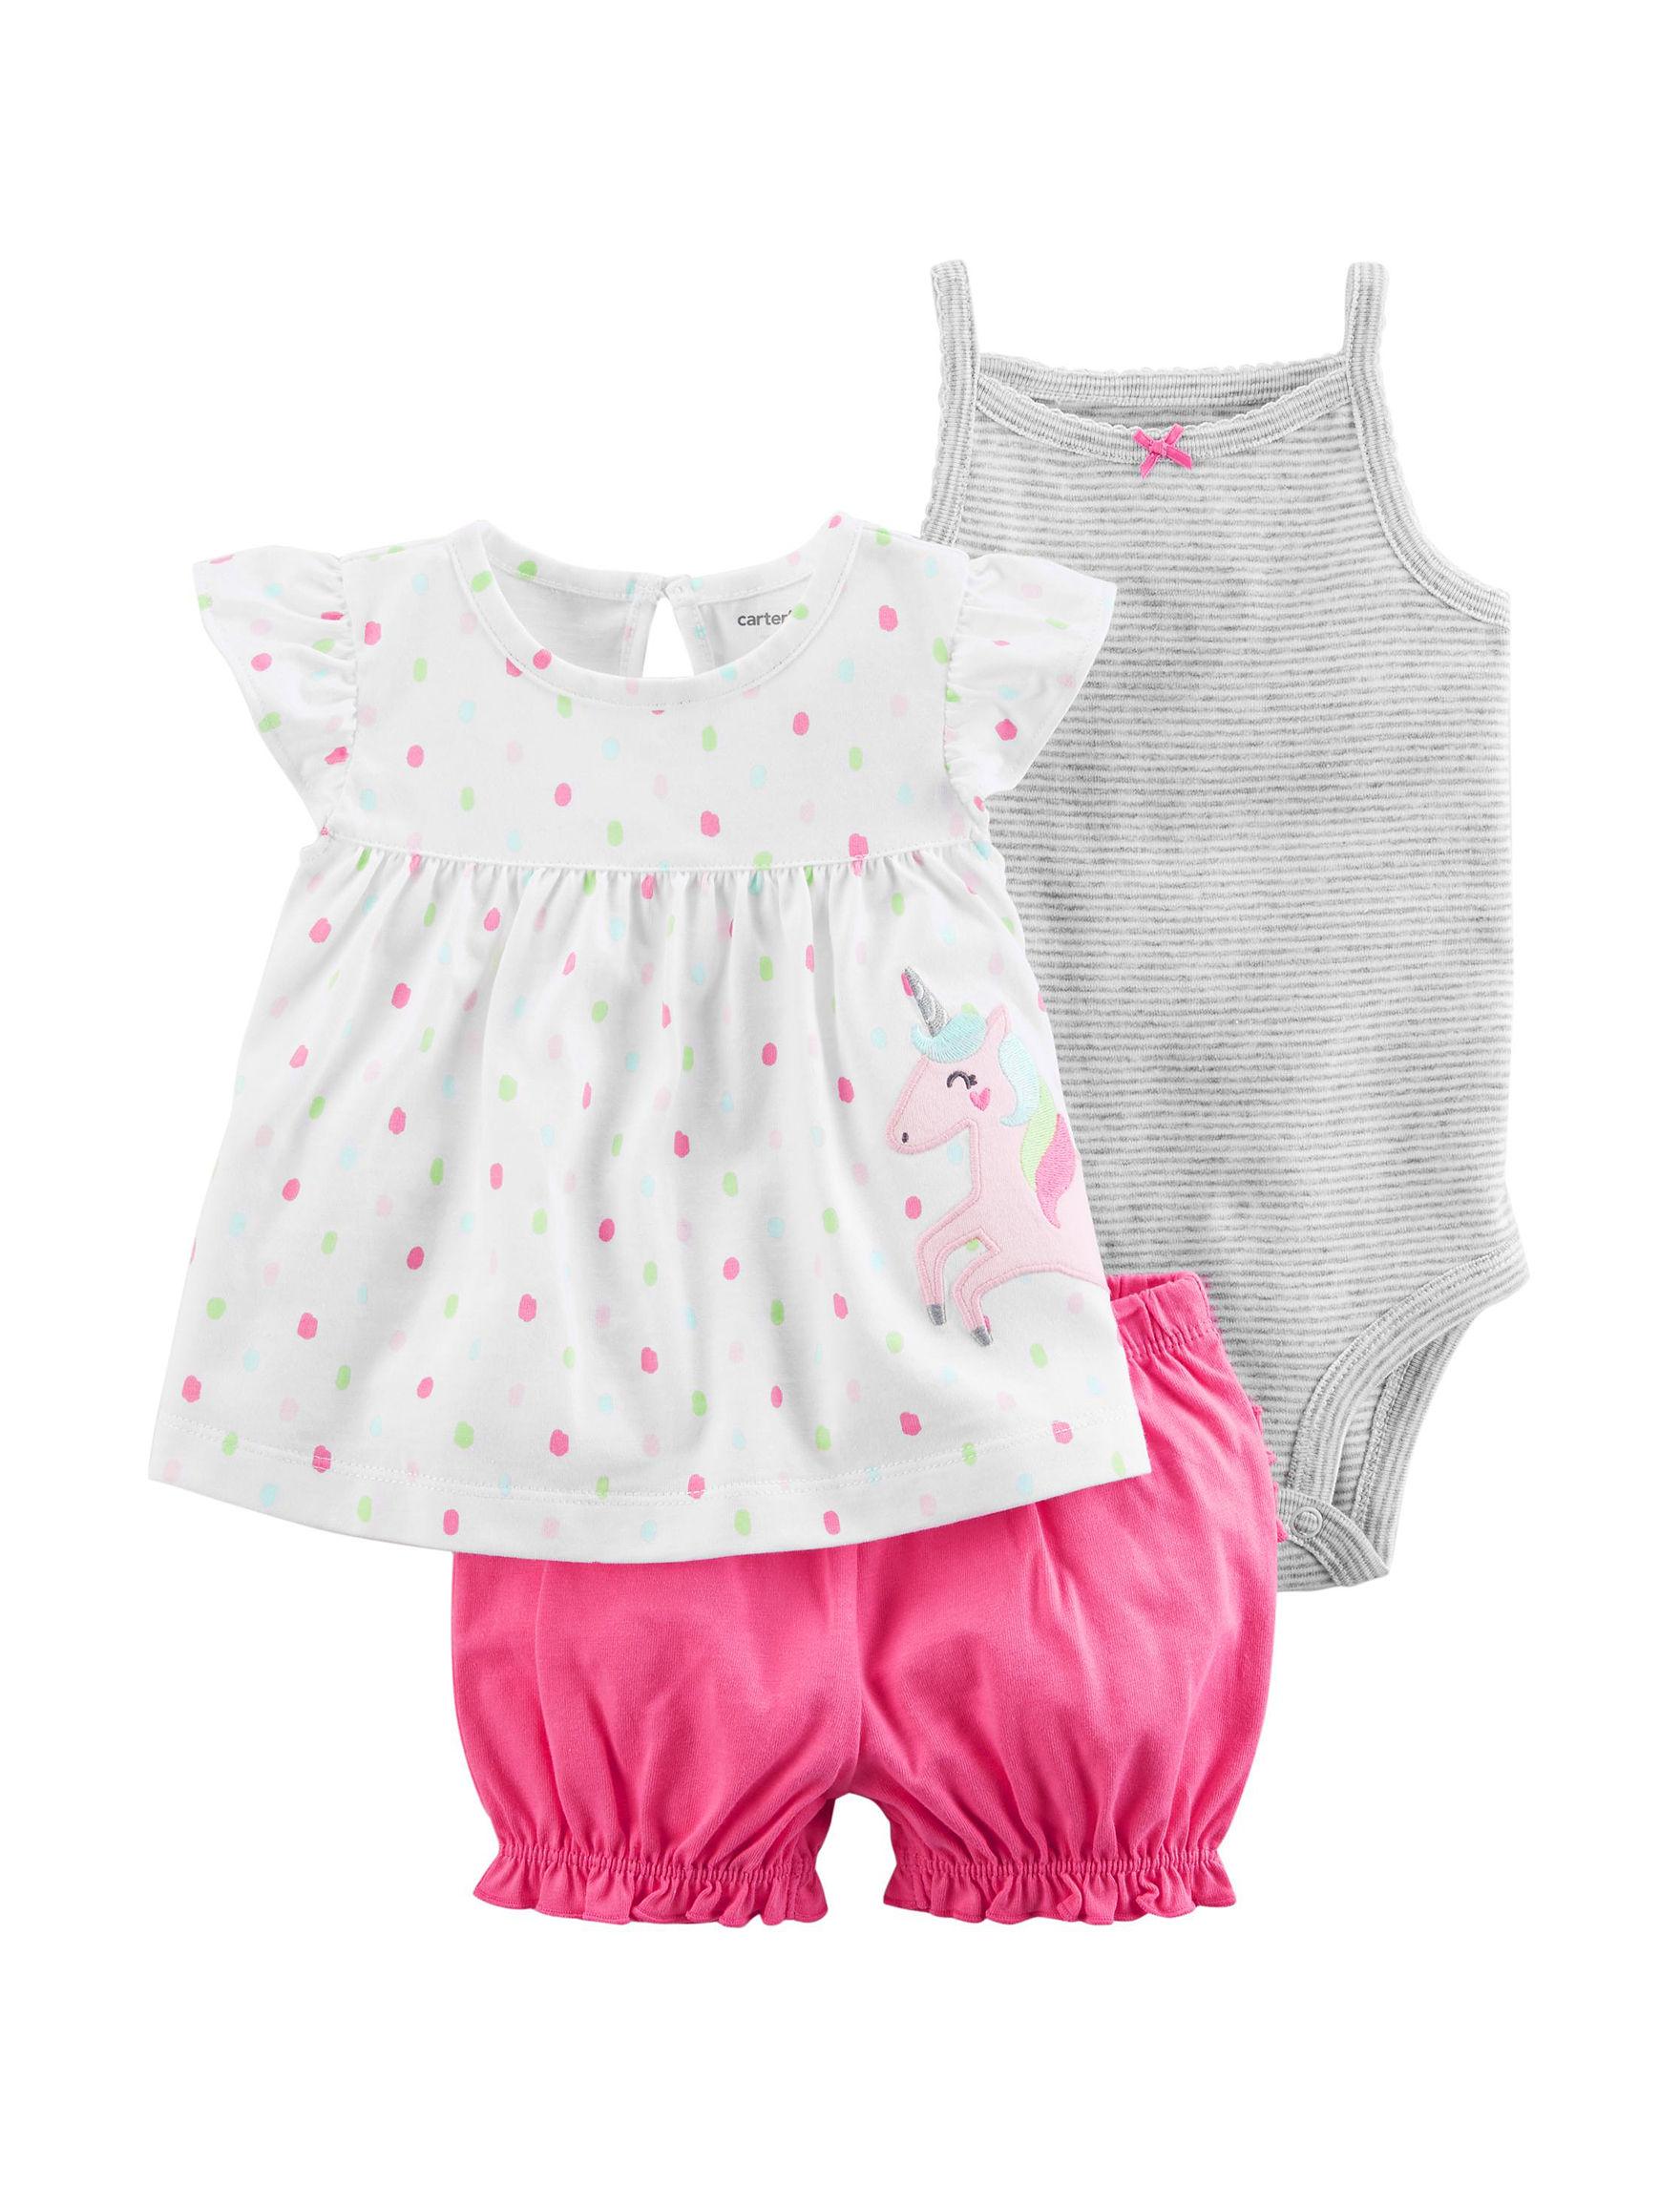 Carter's White / Pink